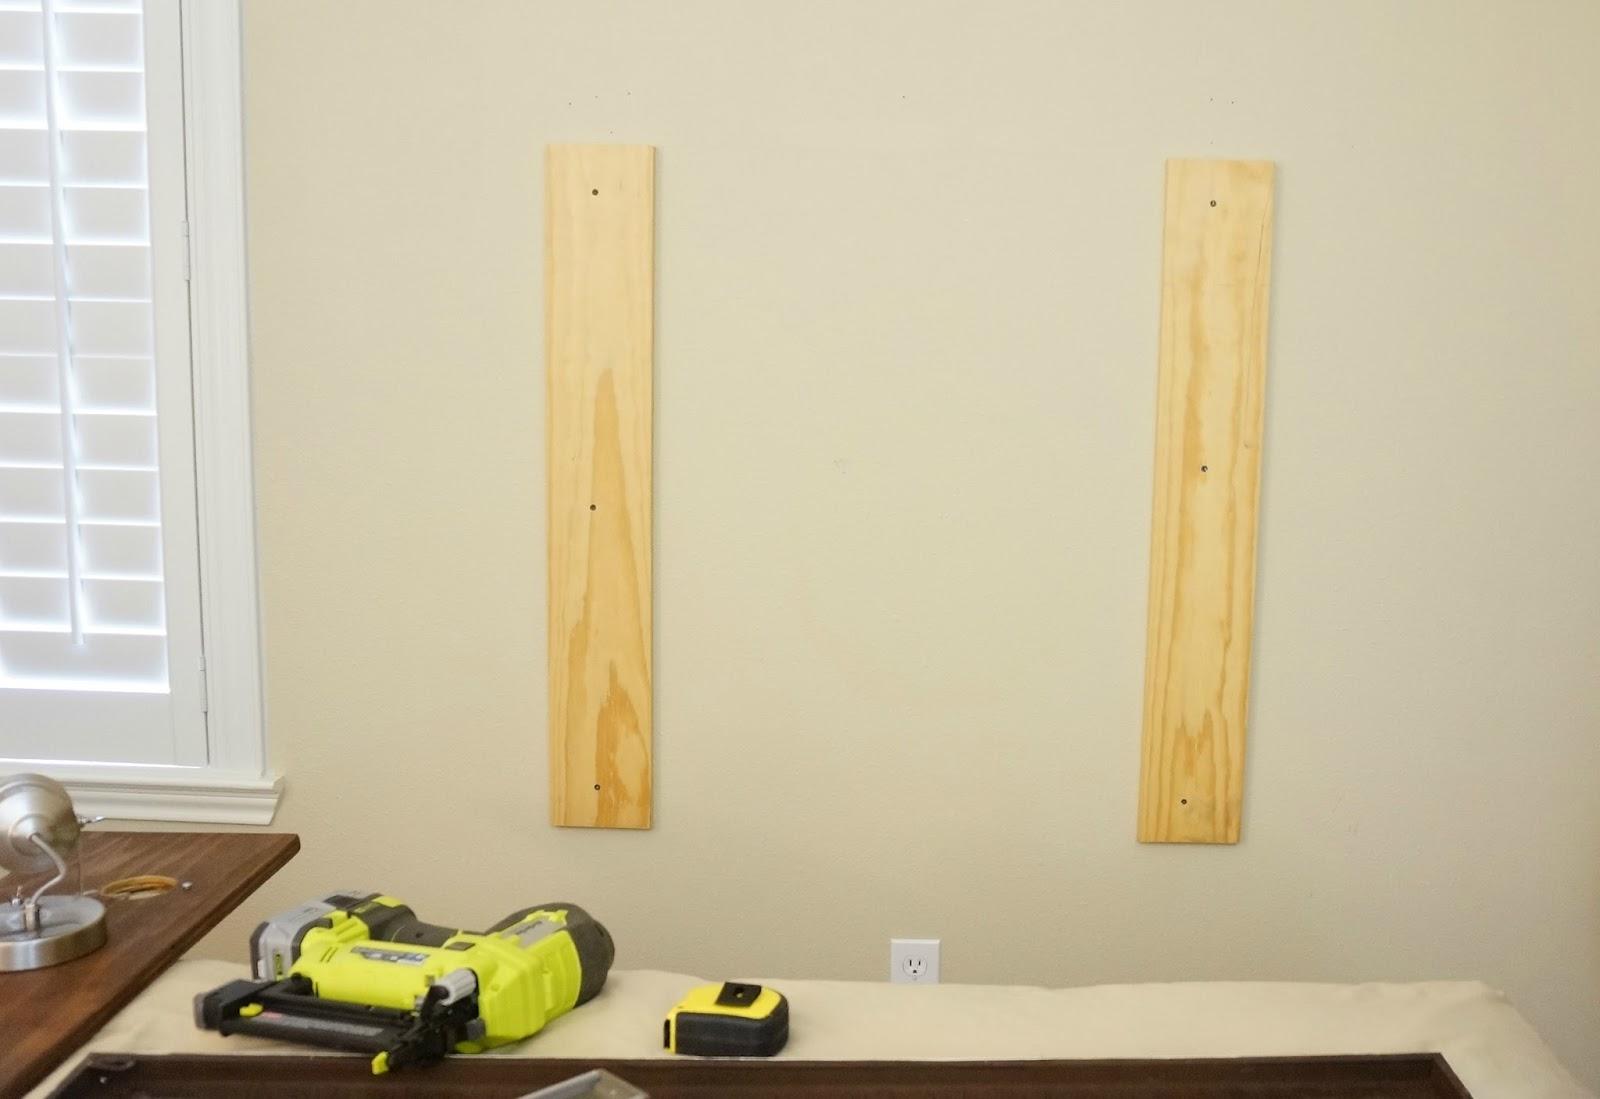 DIY Wood Plank Lighted Headboard